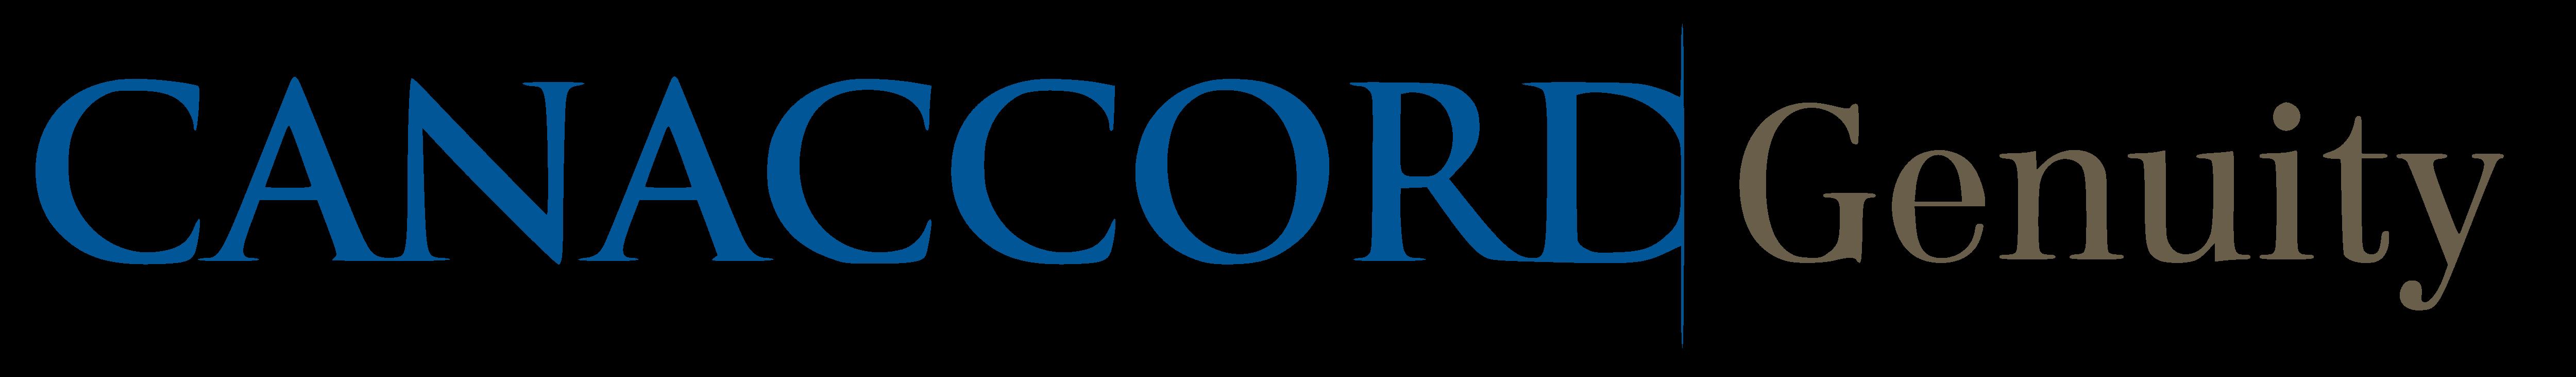 Canaccord Genuity – Logos Download